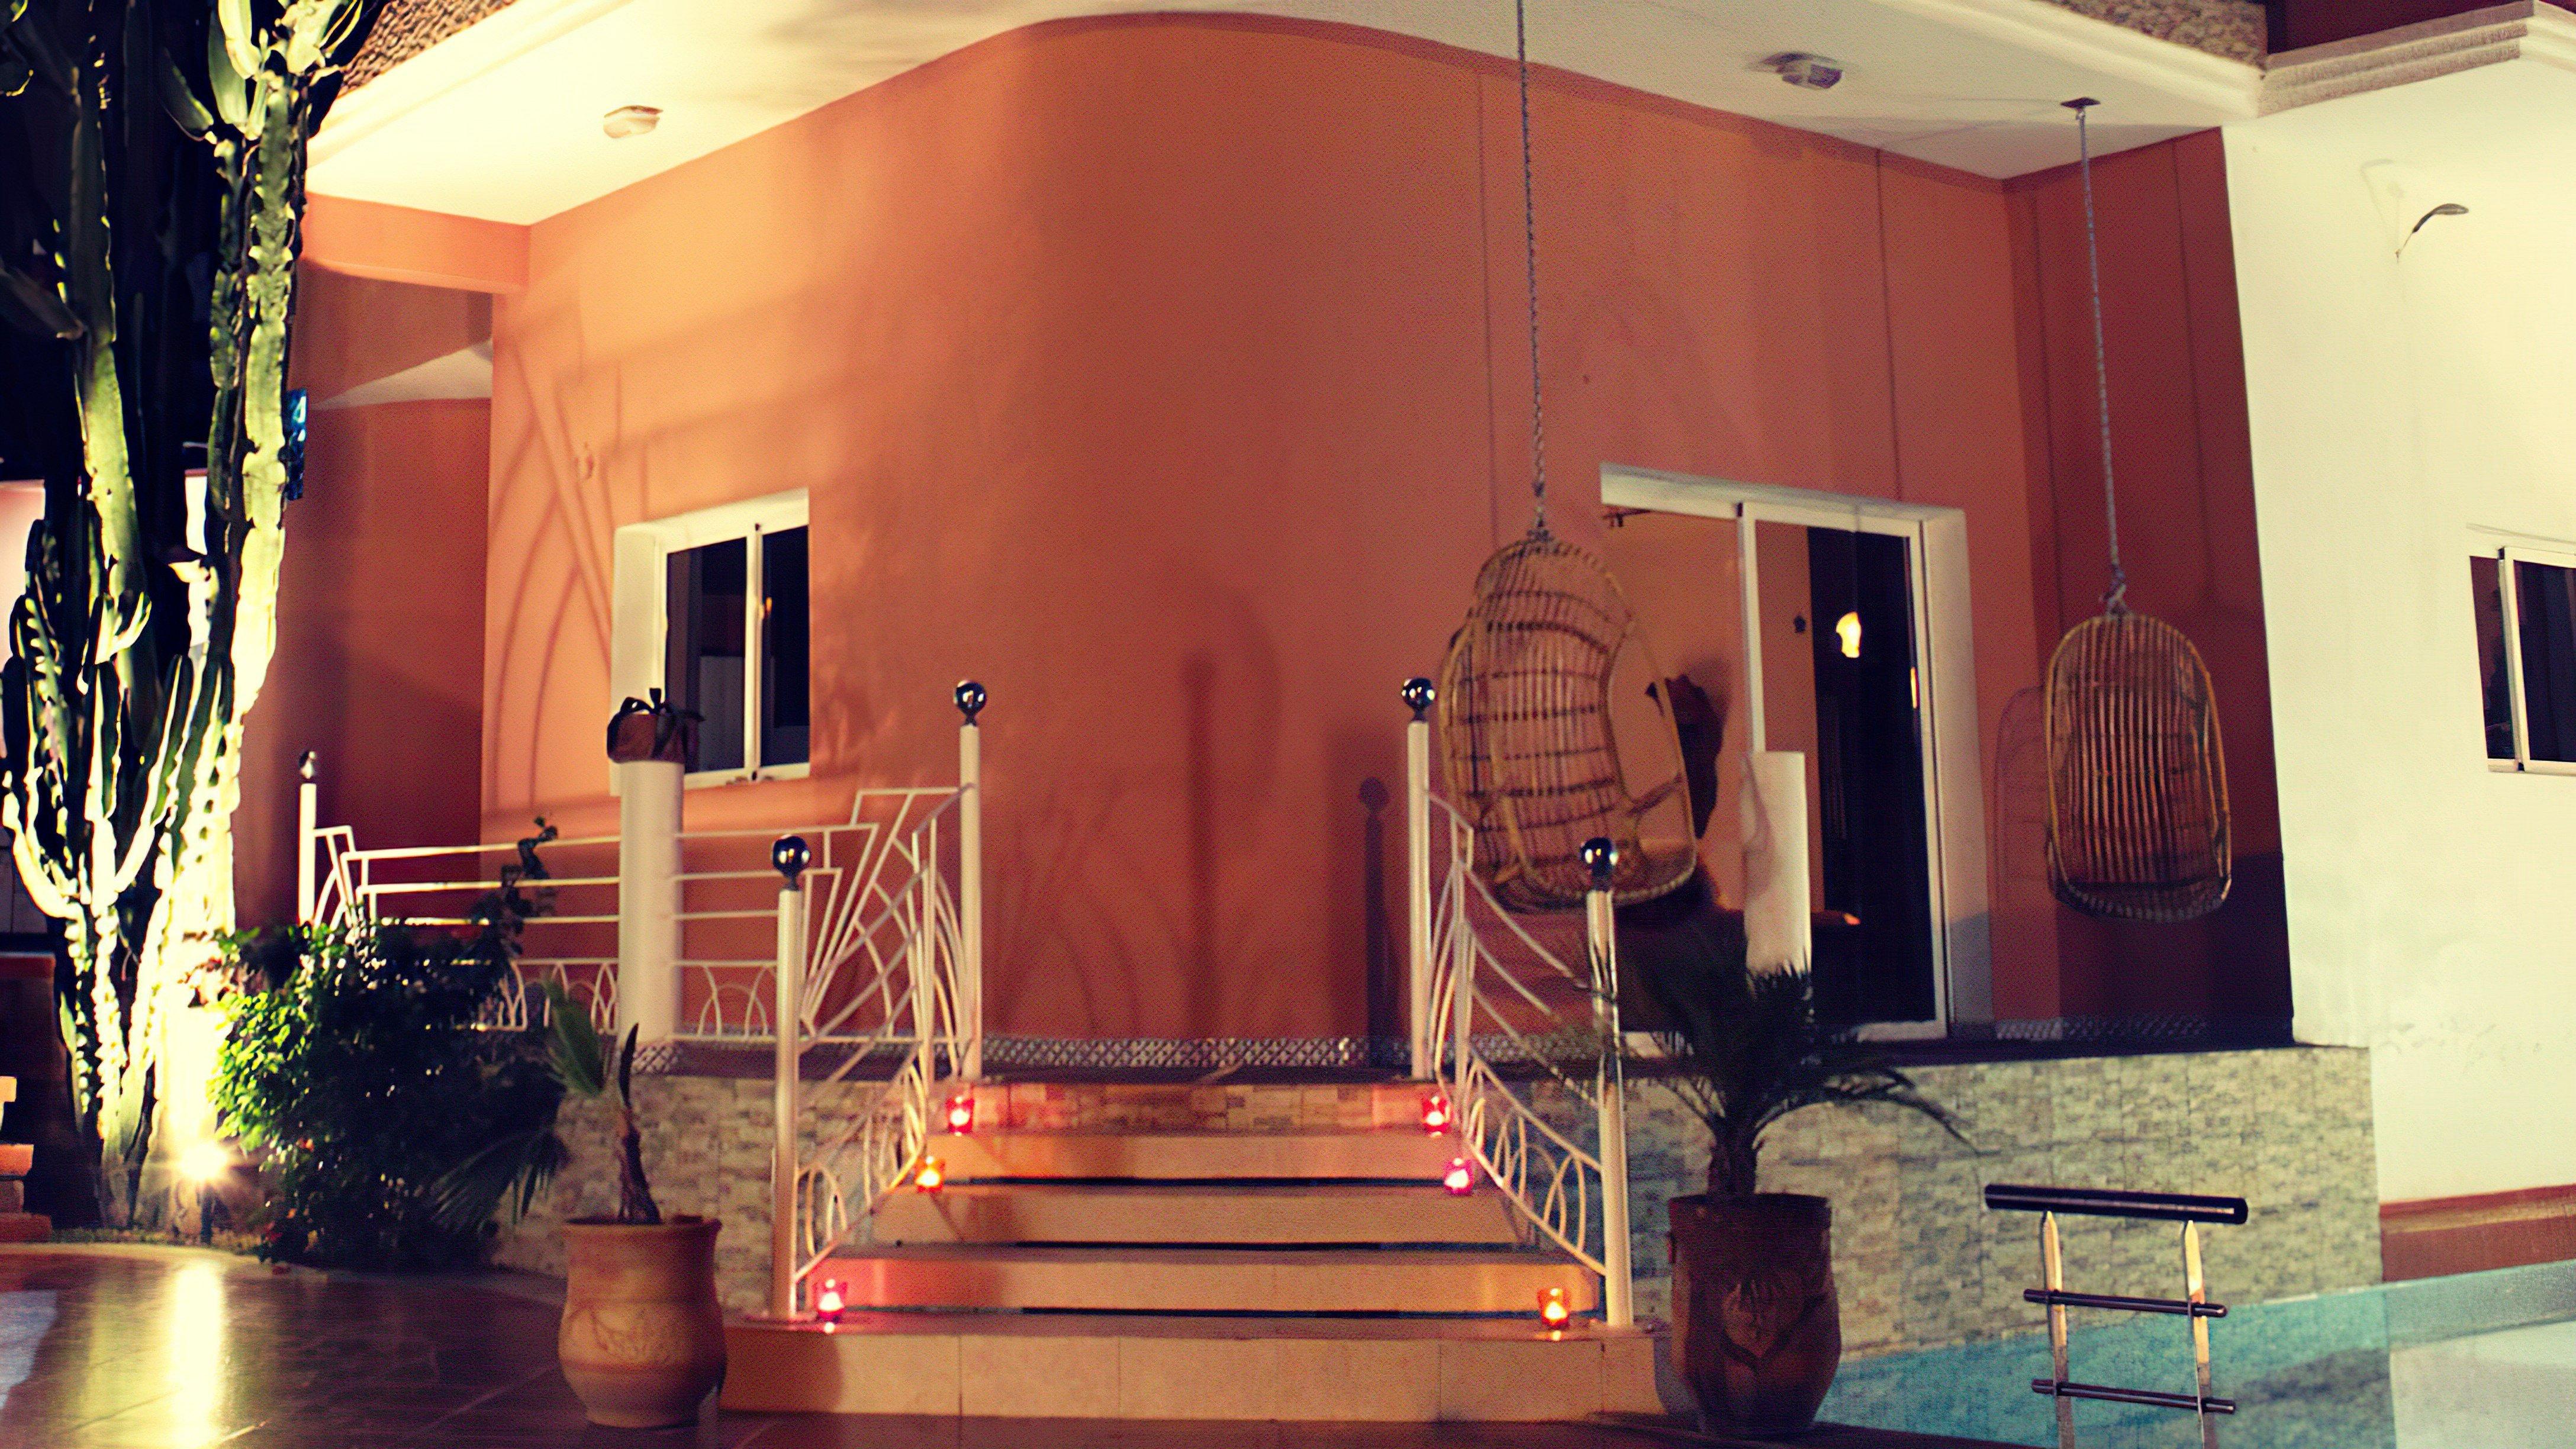 Perfect Solid Surf U0026 Yoga Camp Villa Tamraght, Morocco | LUEX